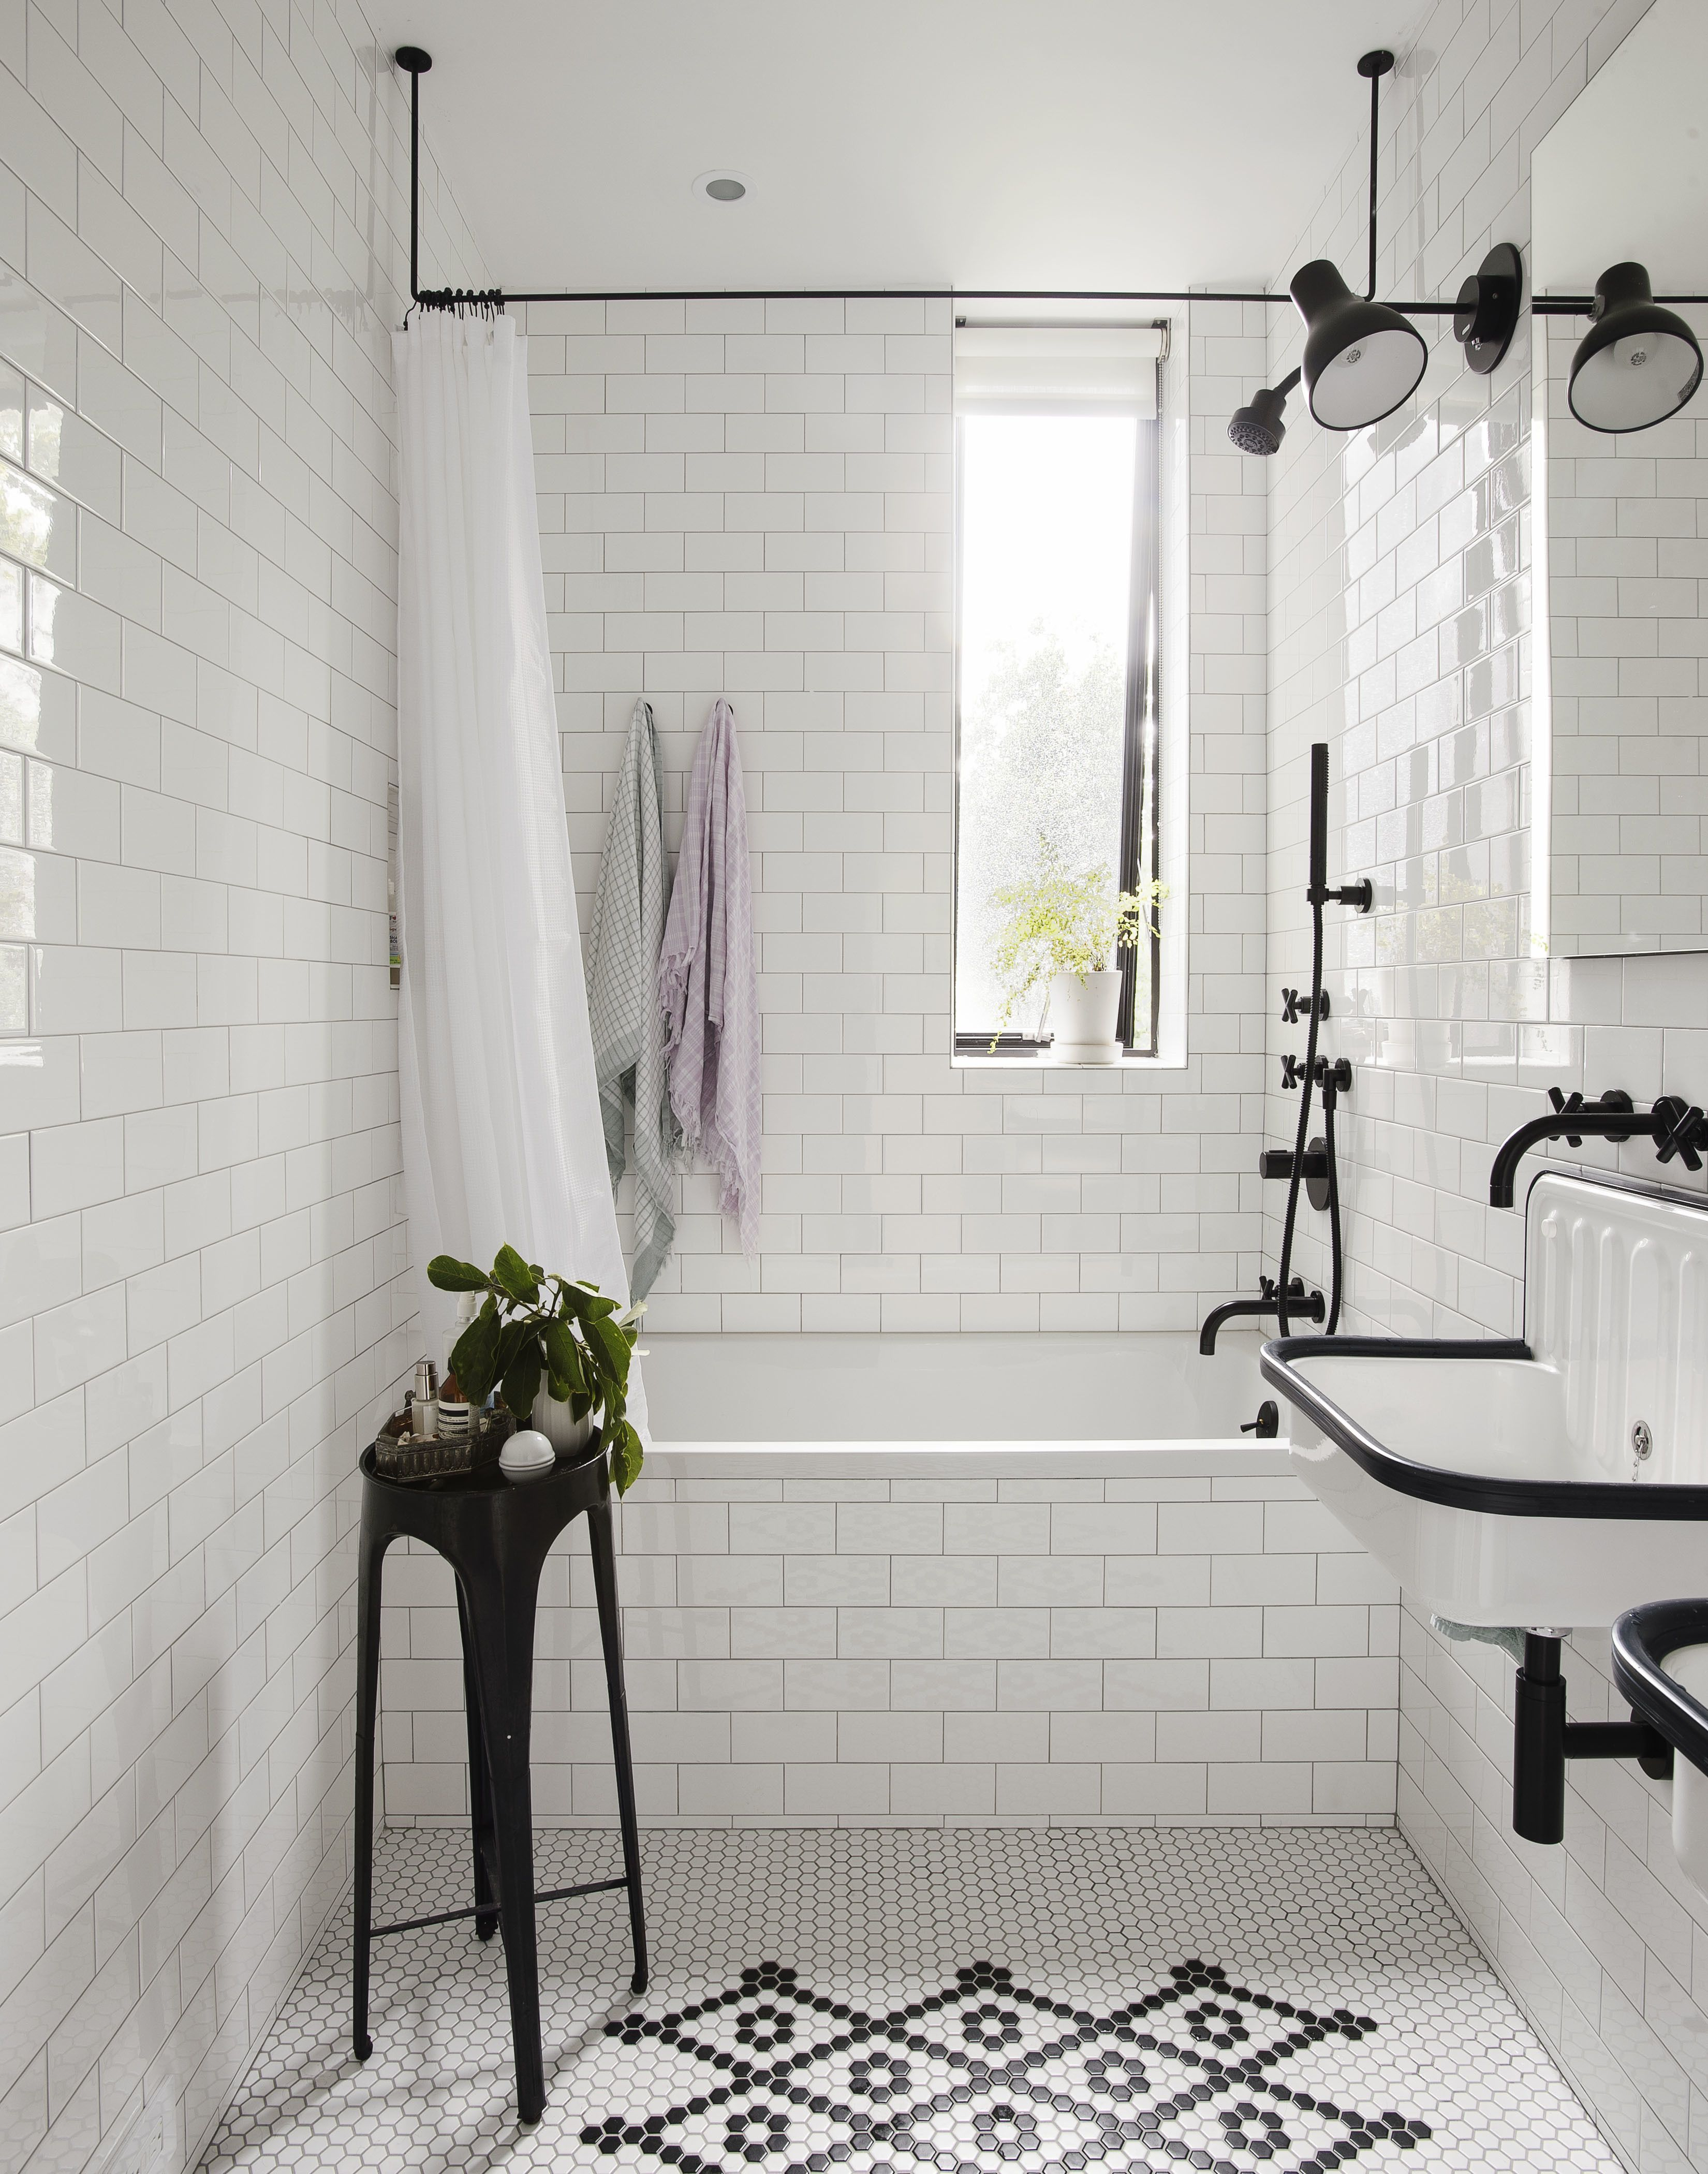 White Black Kids Bathroom Stool Table Ceiling Mounted Shower